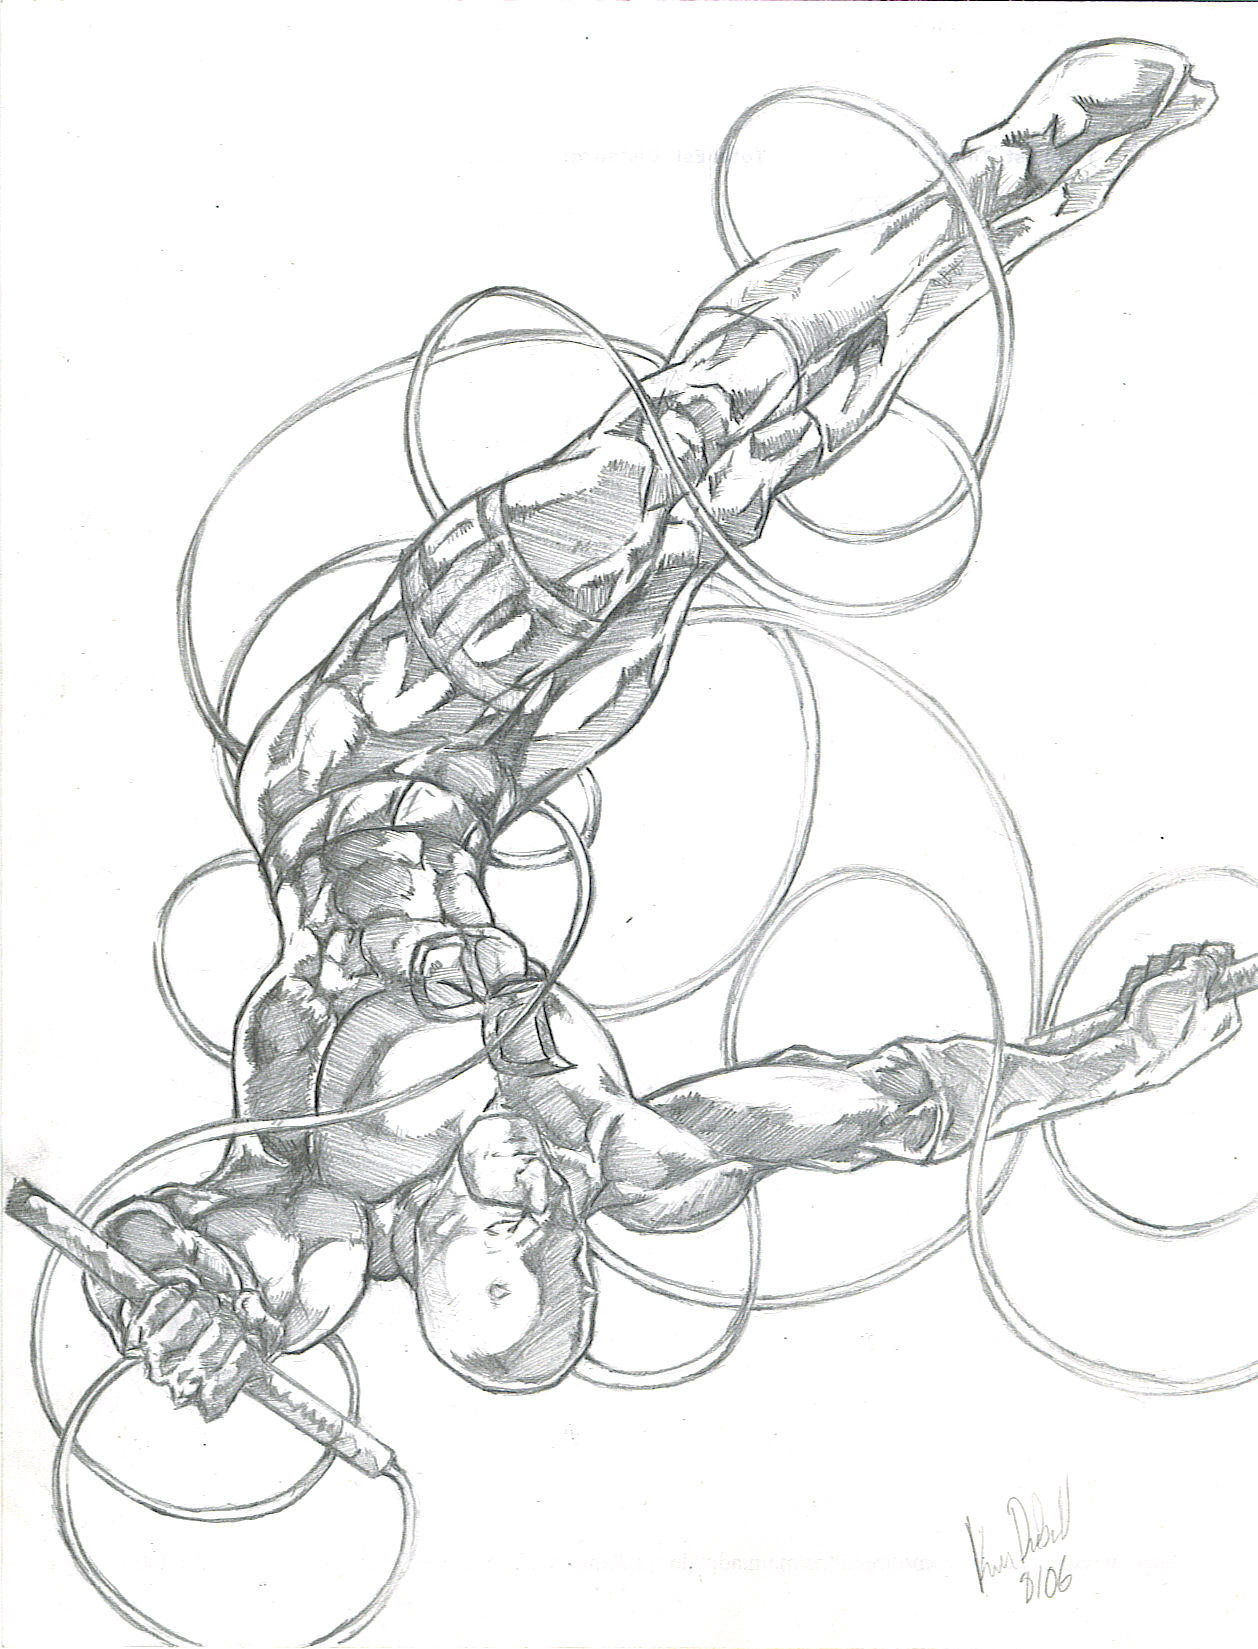 Deviantart coloring clubs - Marvel Comics Club 14 0 Daredevil By Kevman87